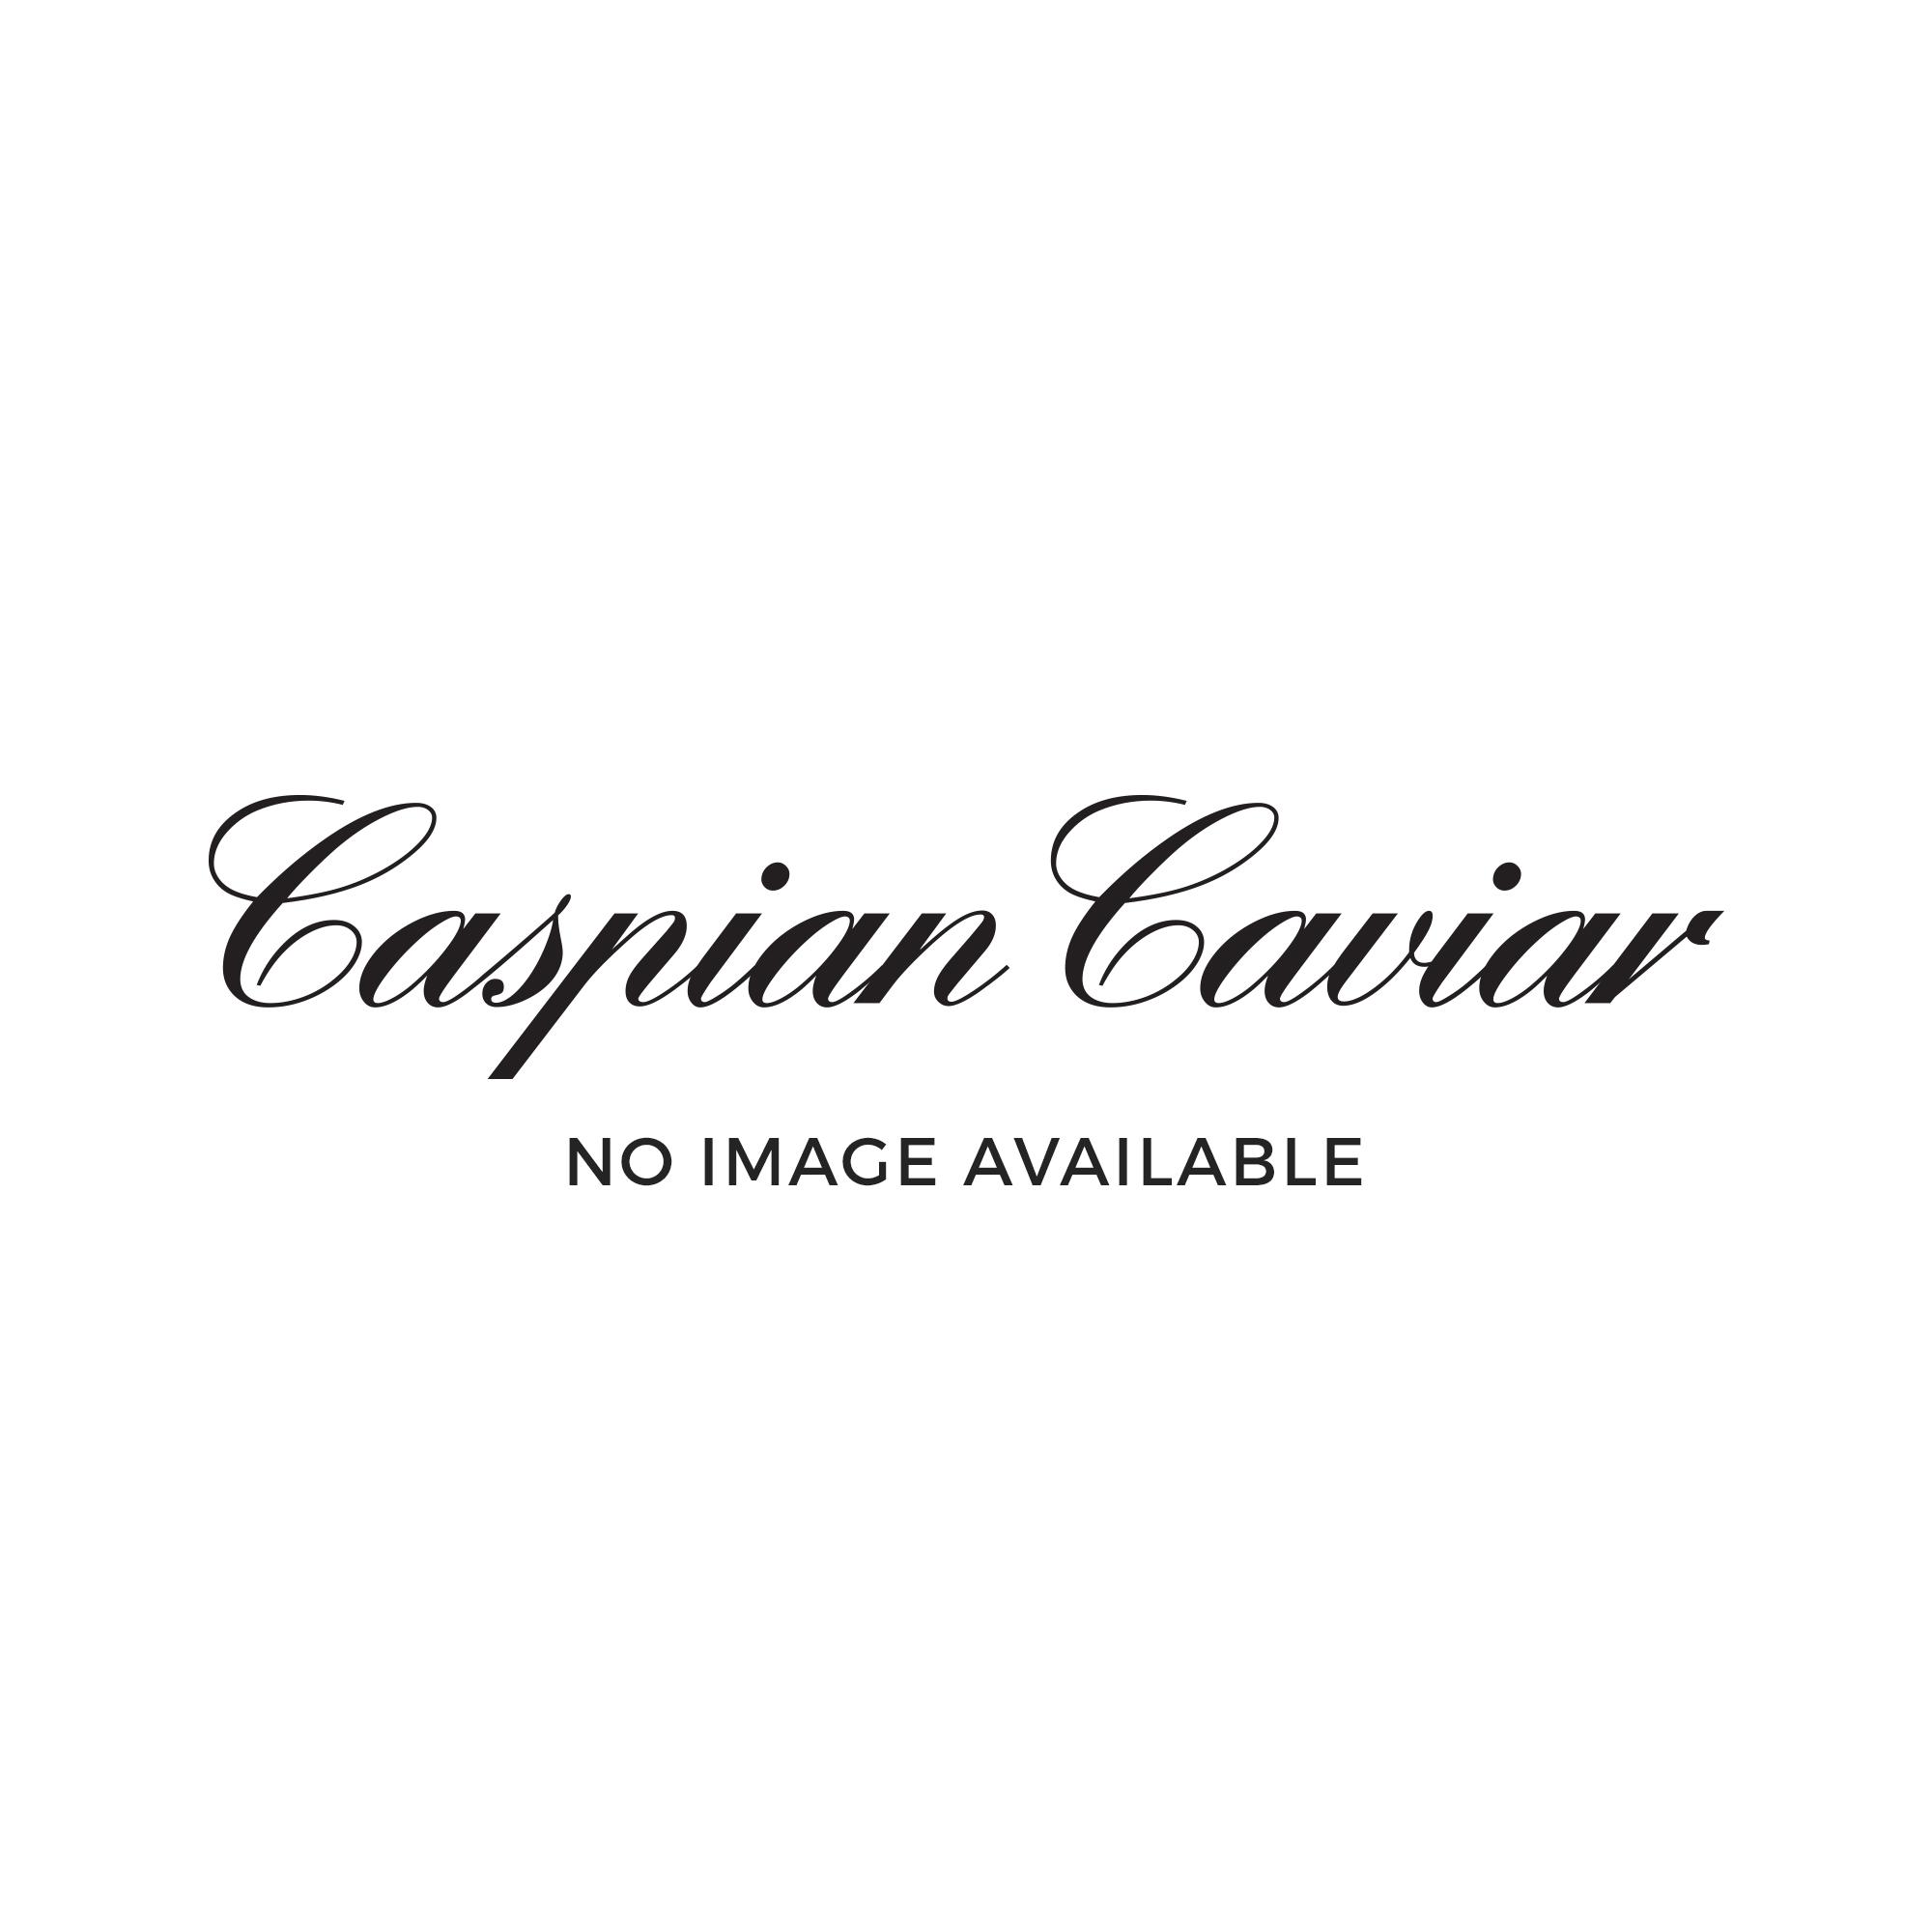 Caspian Caviar Three Cs